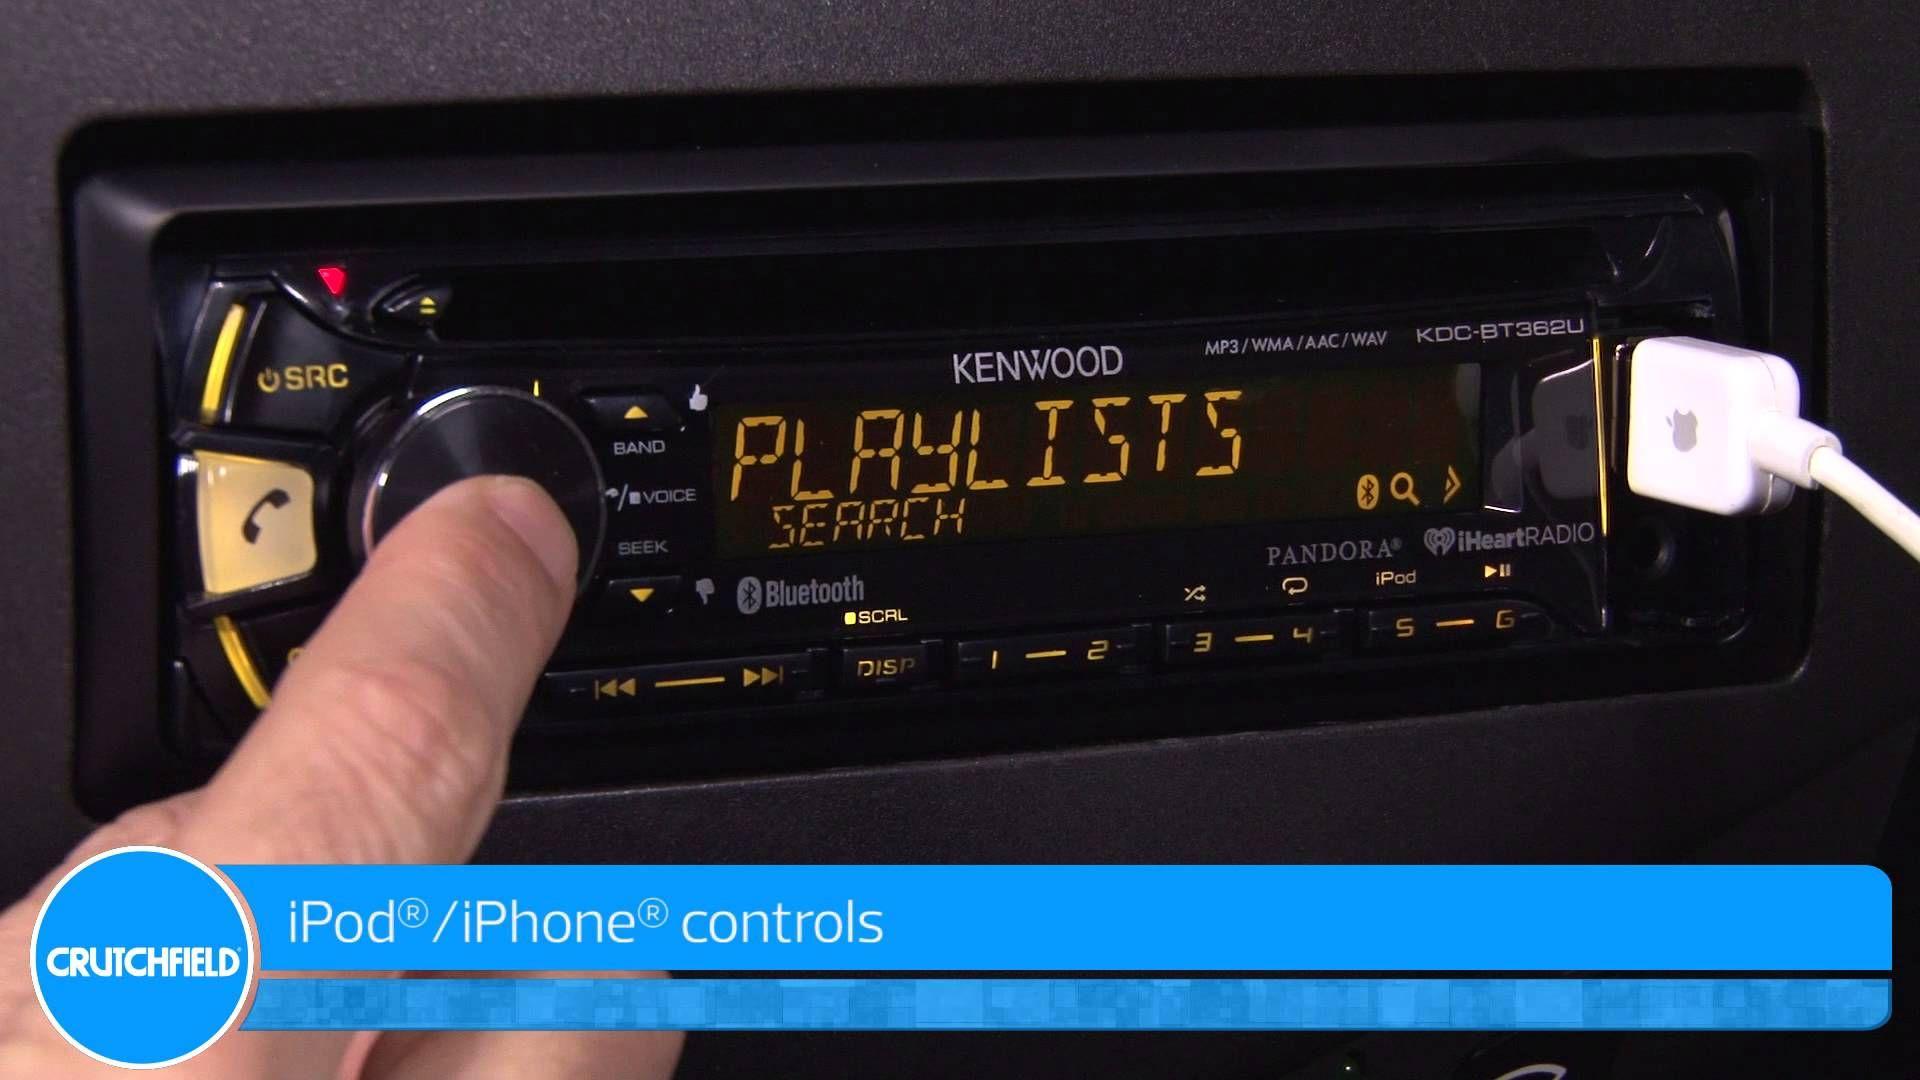 Kenwood KDC-BT362U Display and Controls Demo | Crutchfield